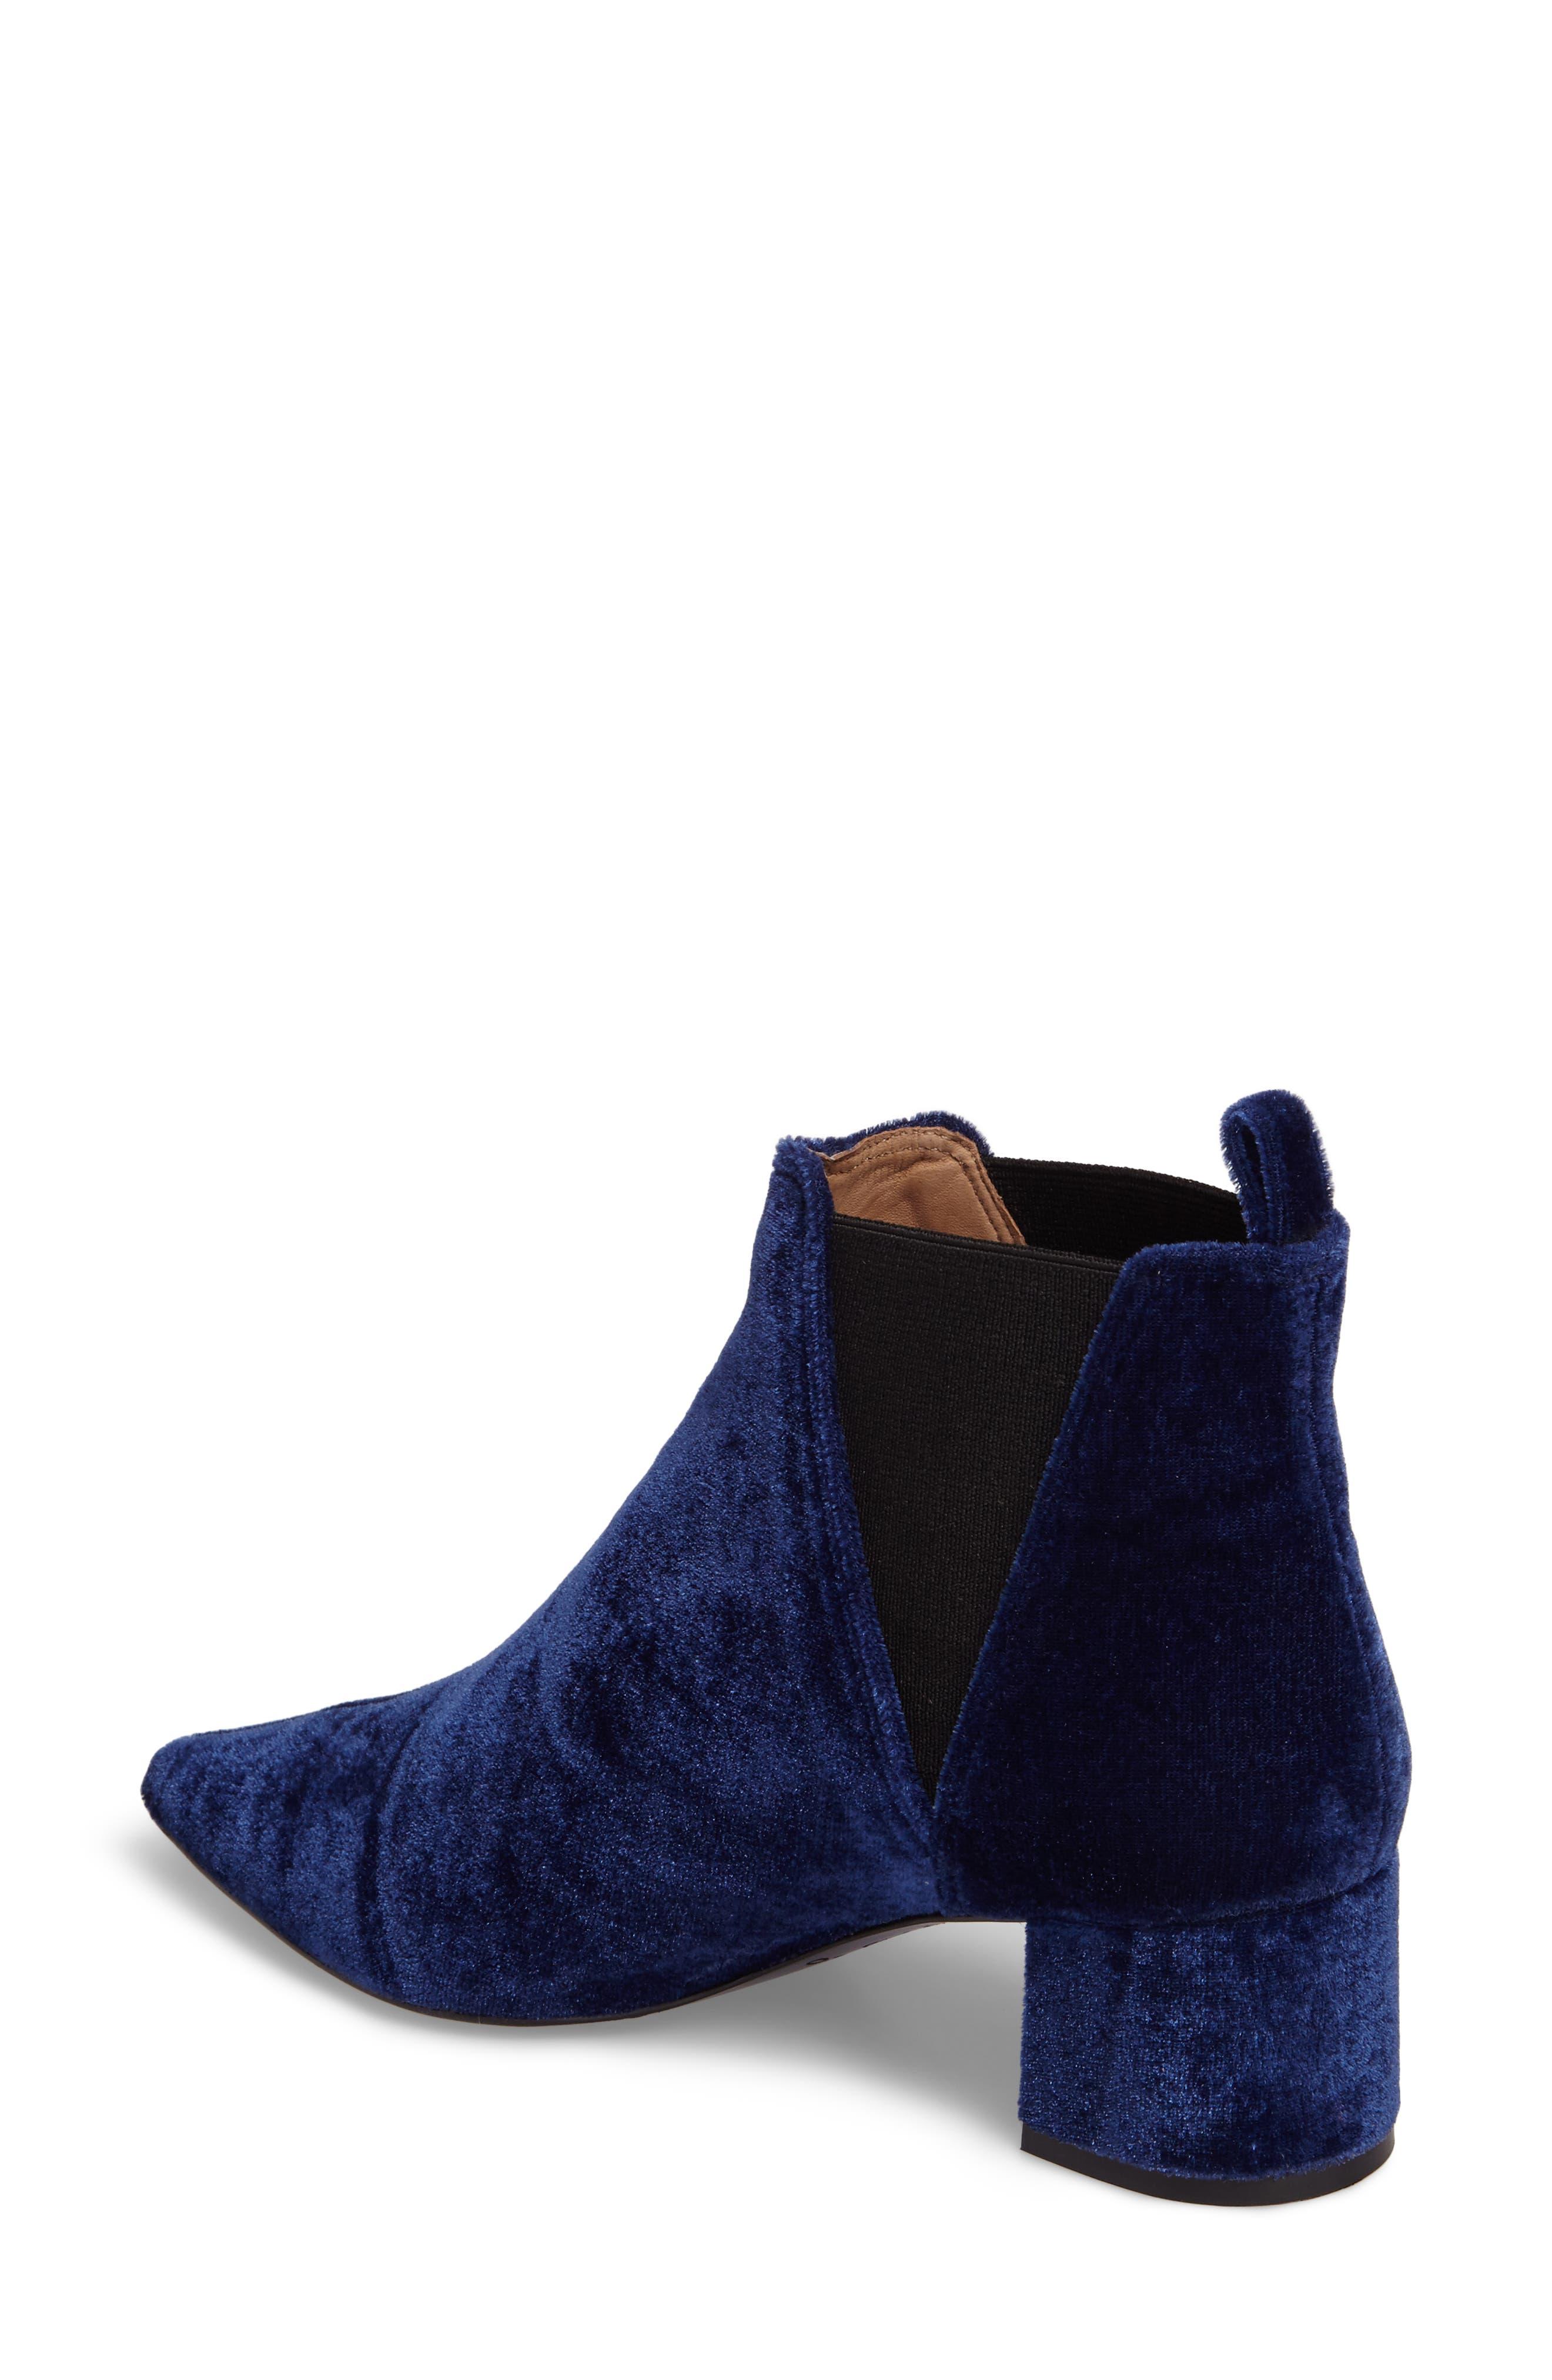 Renita Pointy Toe Chelsea Bootie,                             Alternate thumbnail 2, color,                             BLUE VELVET FABRIC